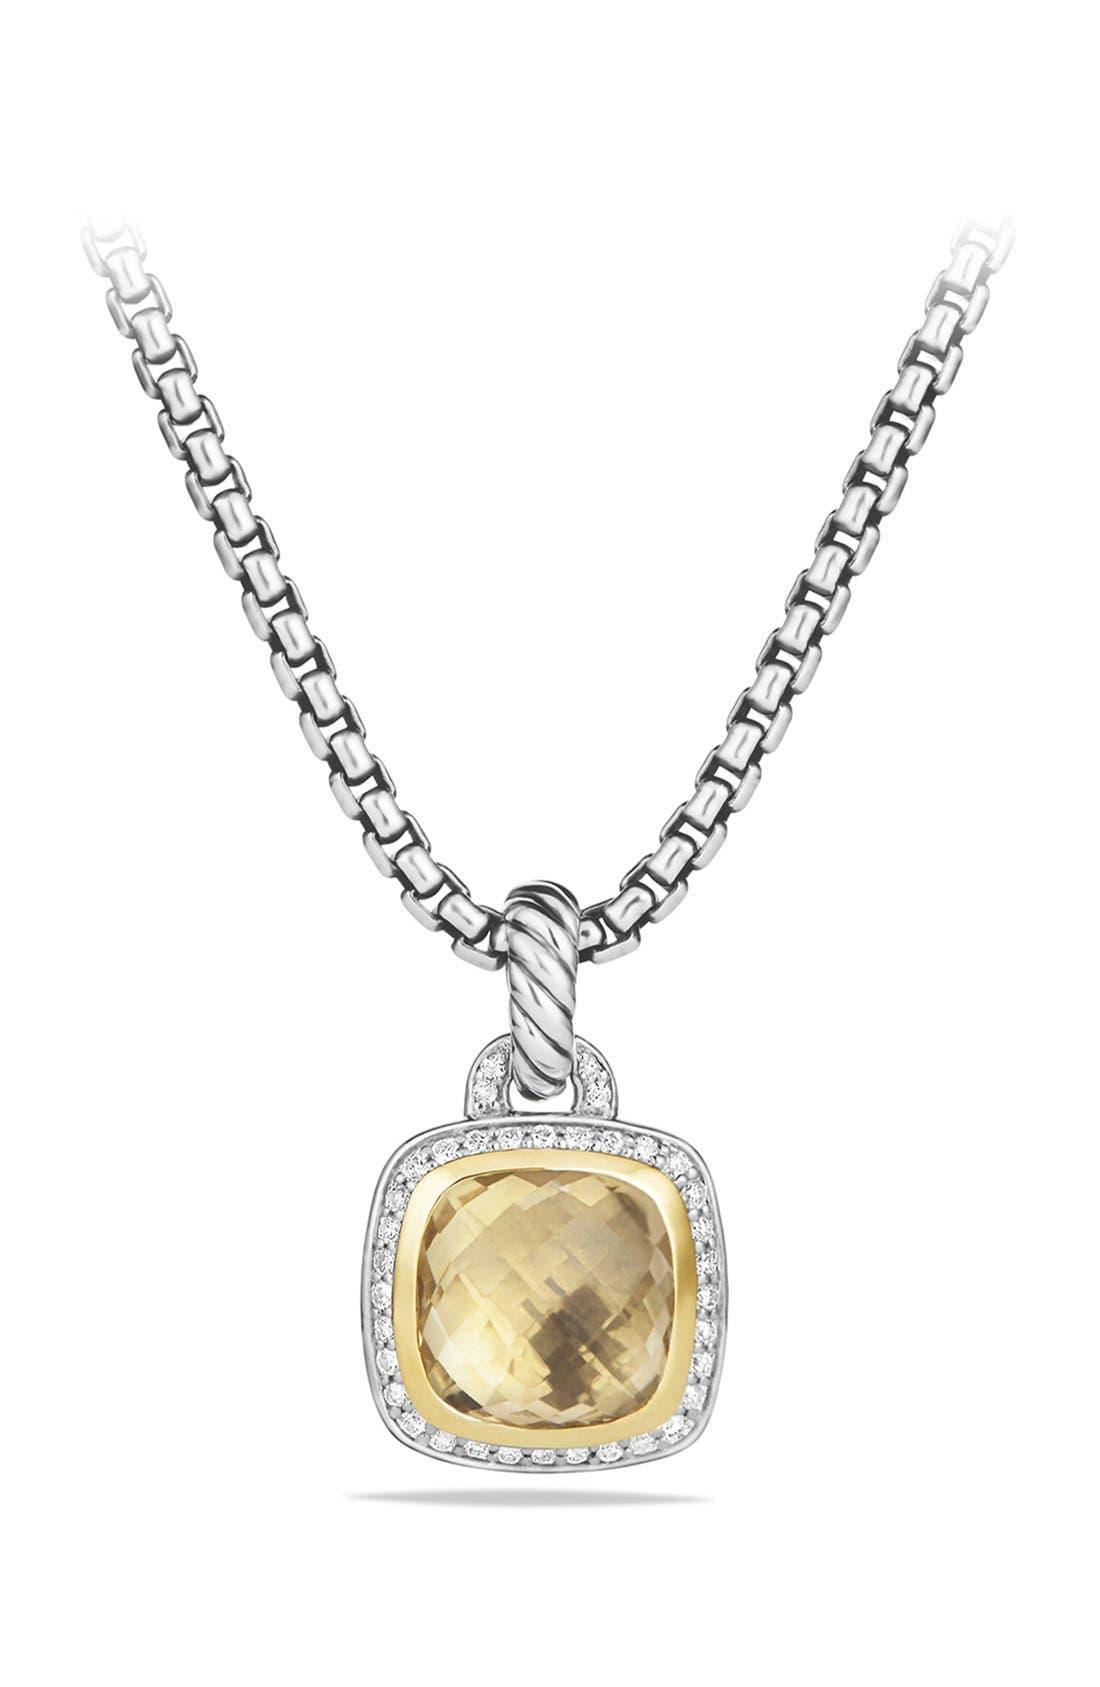 DAVID YURMAN,                             'Albion' Pendant with Diamonds and 18K Gold,                             Main thumbnail 1, color,                             CHAMPAGNE CITRINE